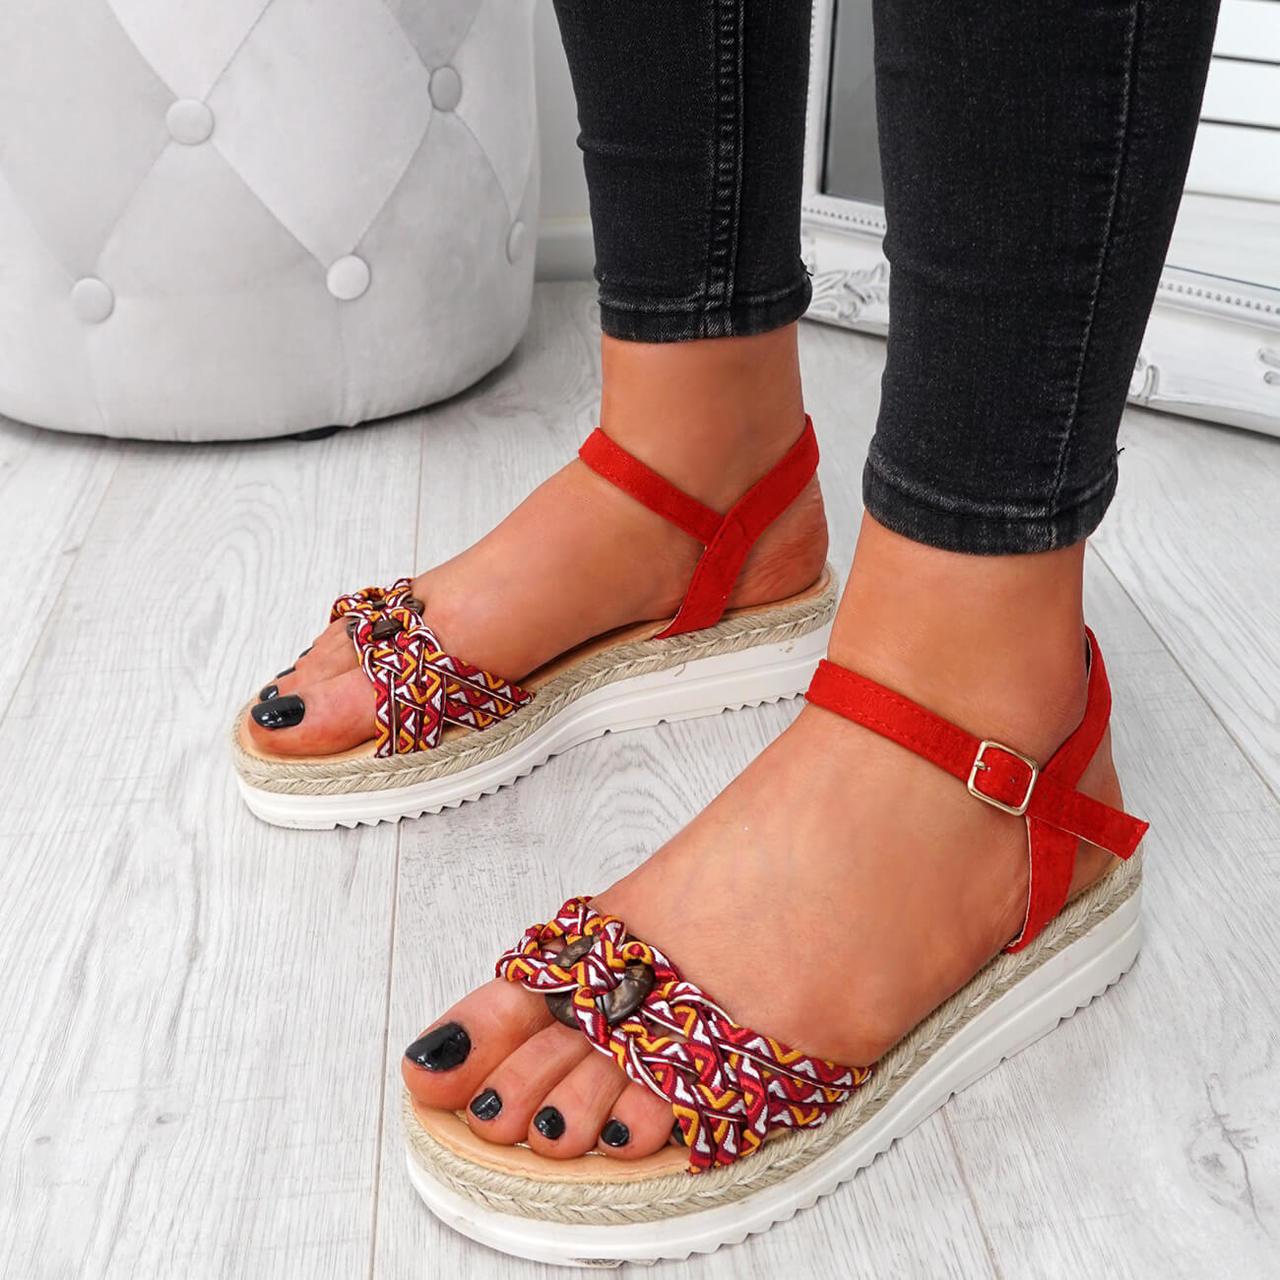 e05598a59 Womens Ladies Ankle Strap Flat Sandals Multicolor Summer Shoes Size